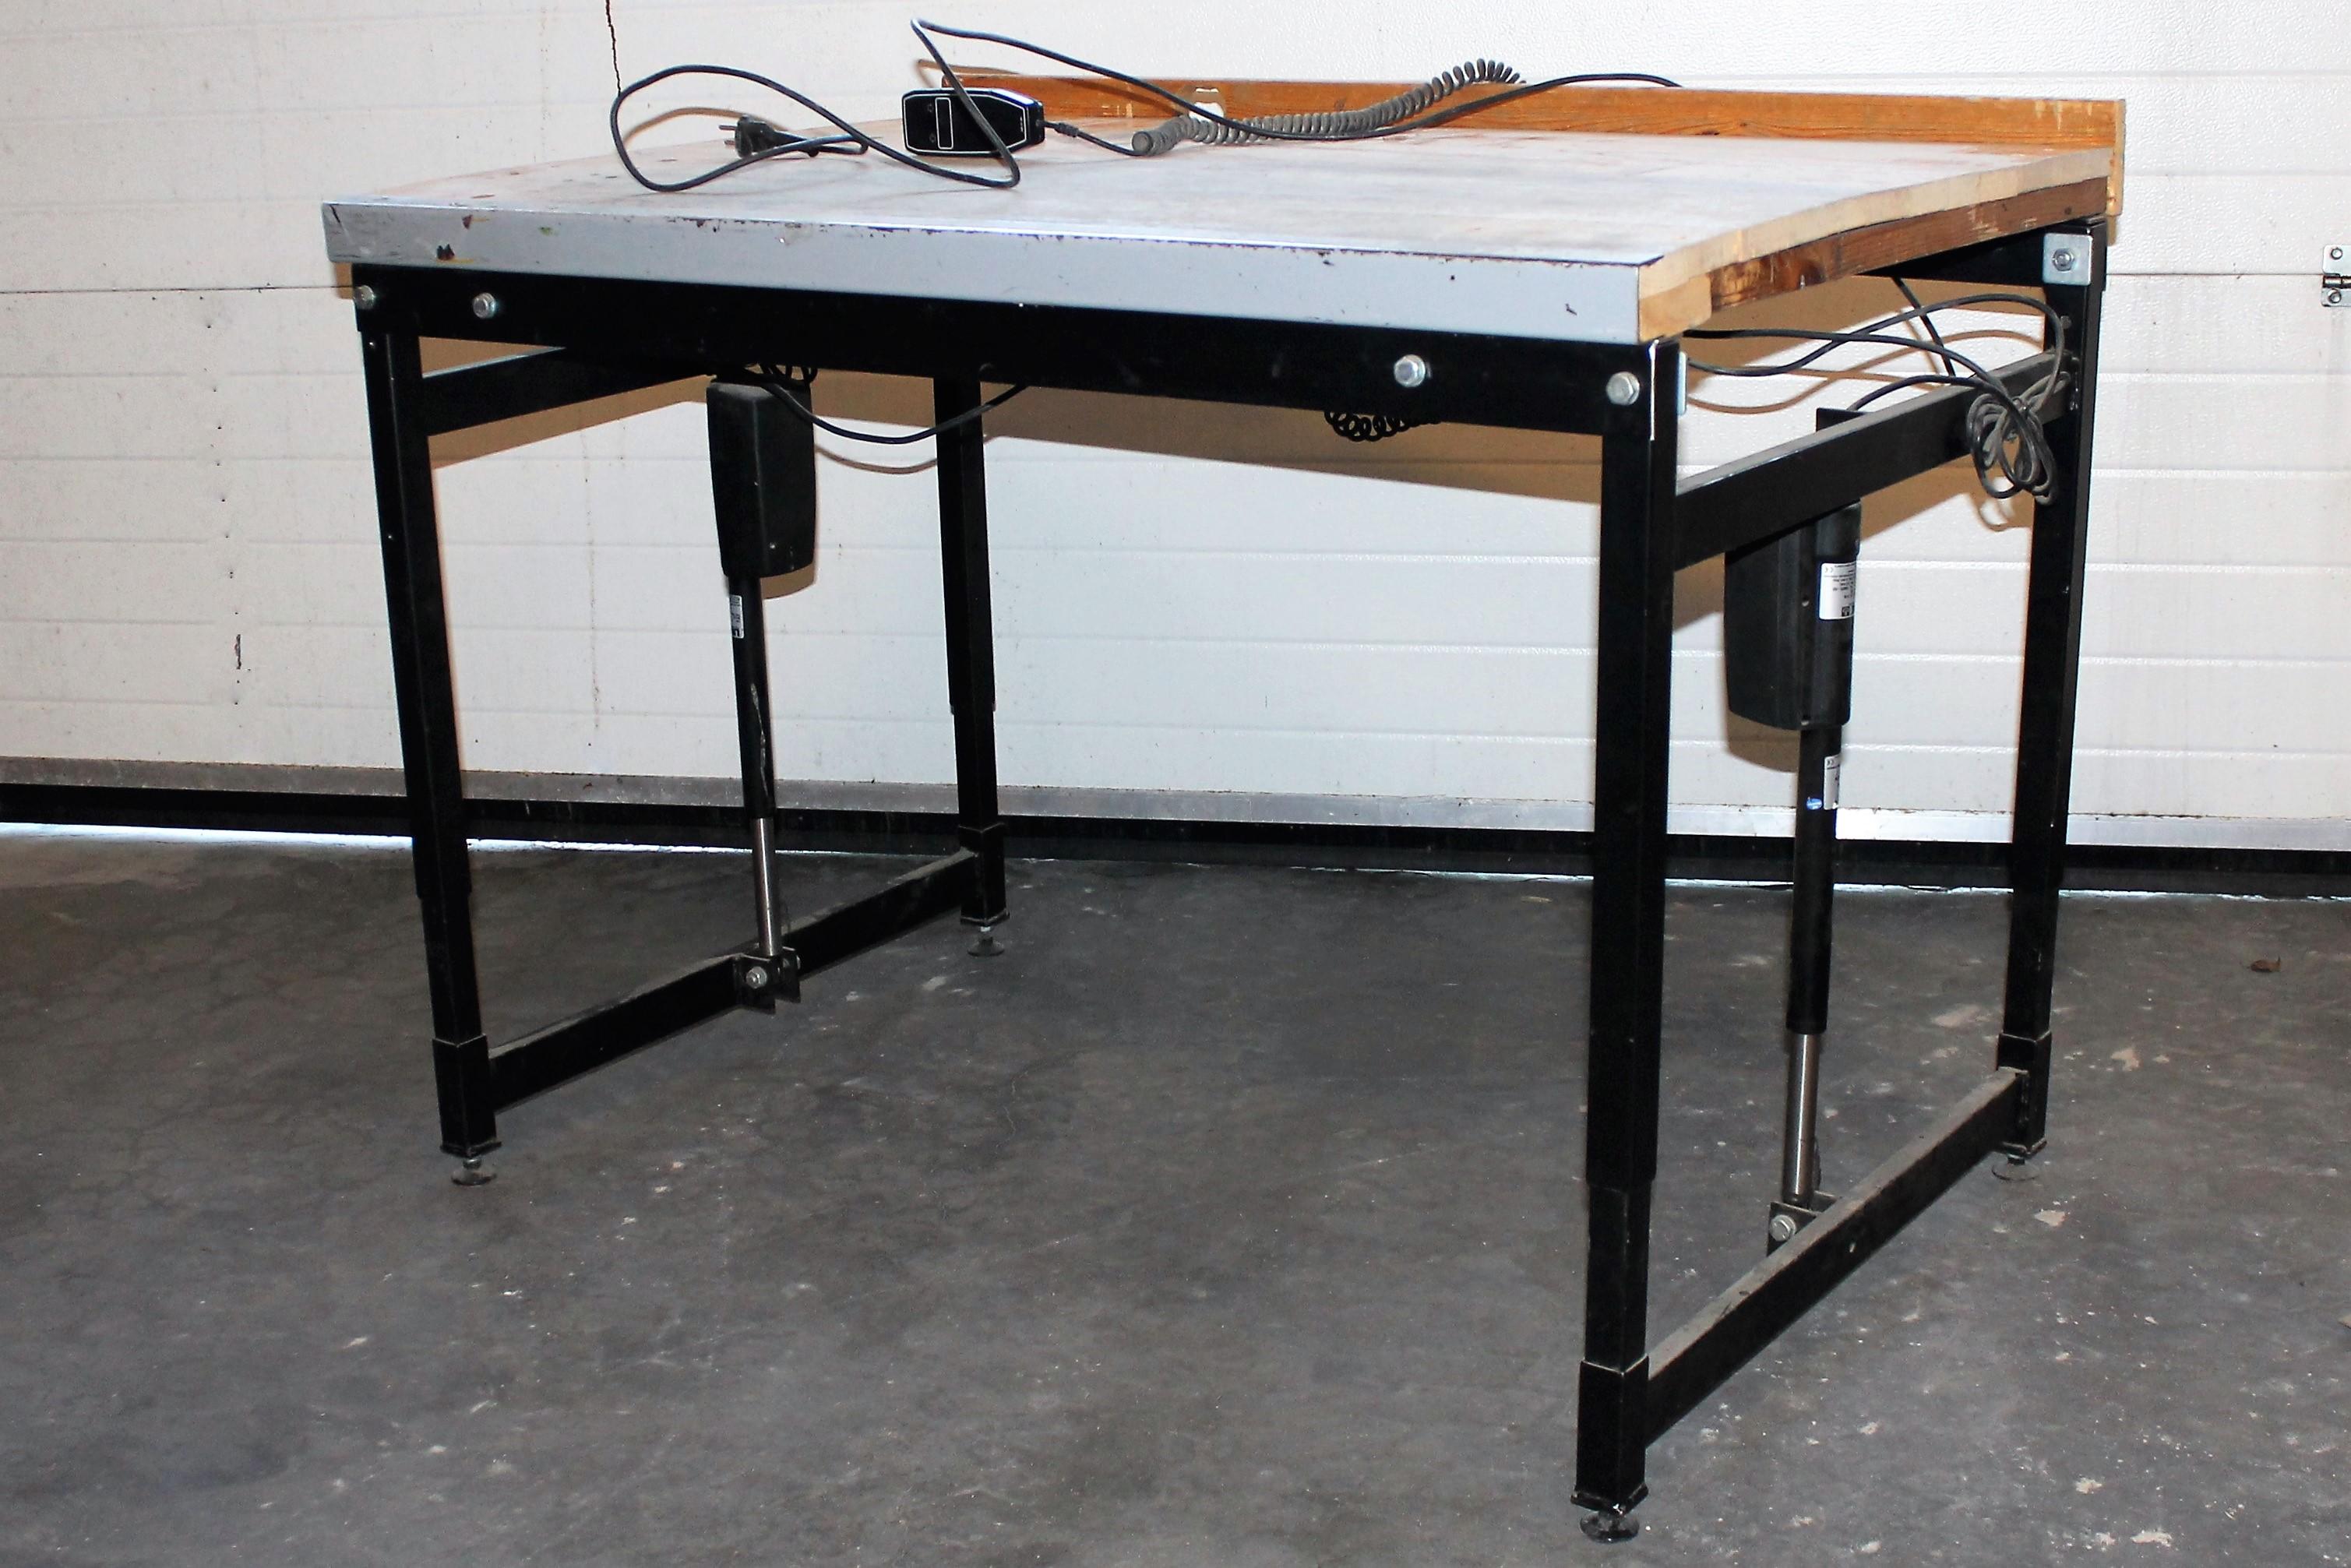 hæve sænkebord 1200x800mm